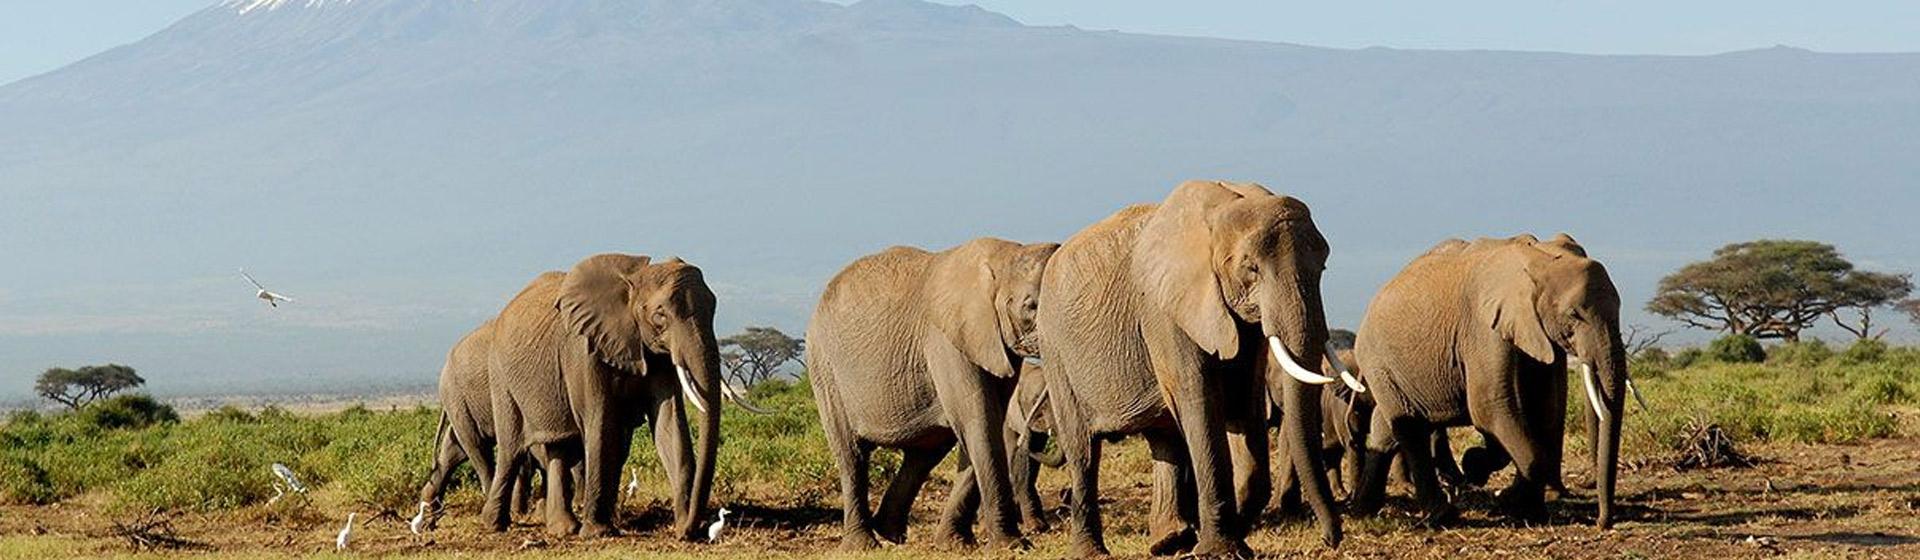 Kenya and Tanzania Wildlife Safari